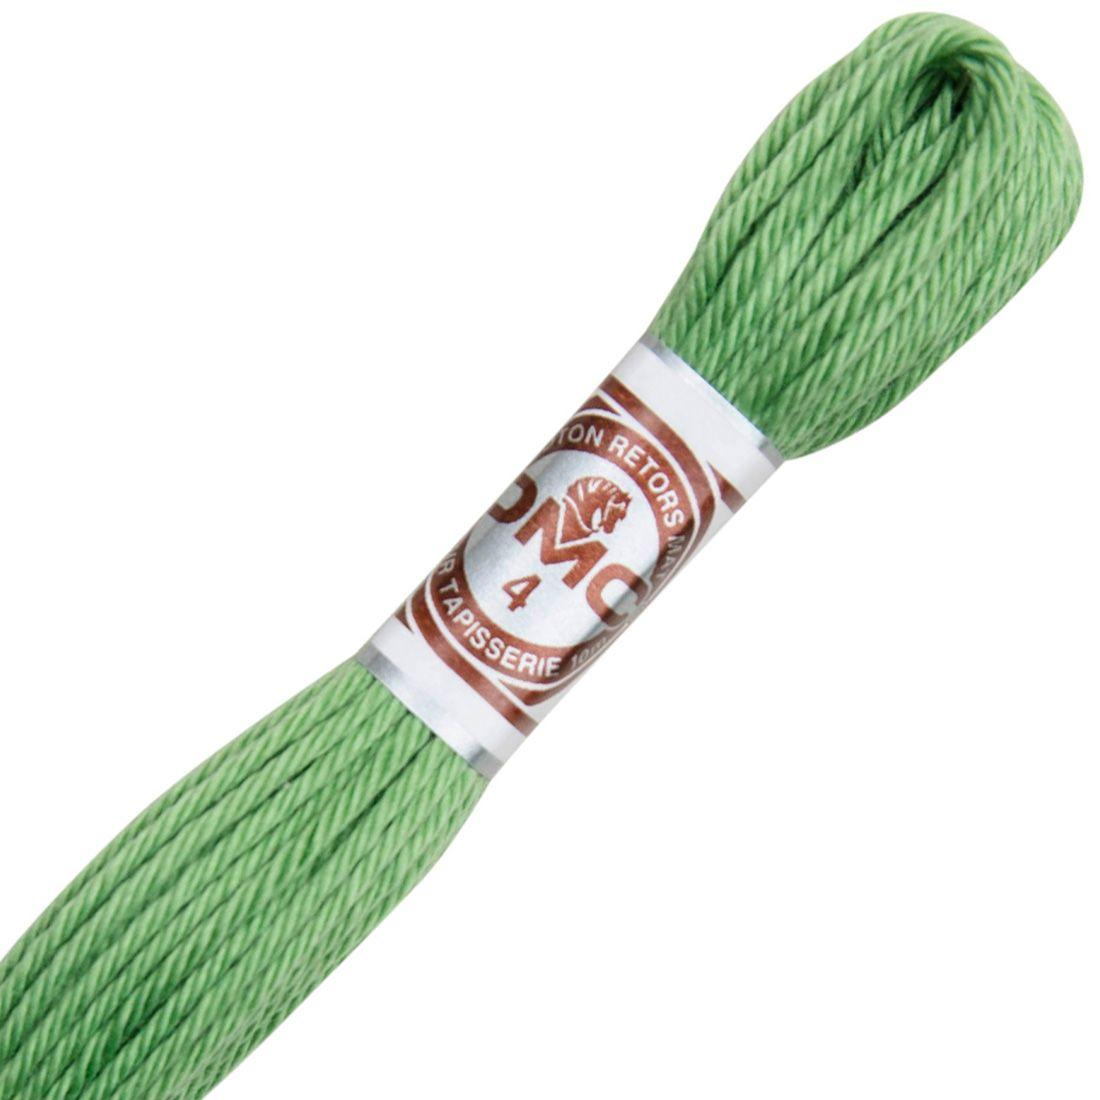 Fil retors mat canevas dmc n 2563 vert fenouil